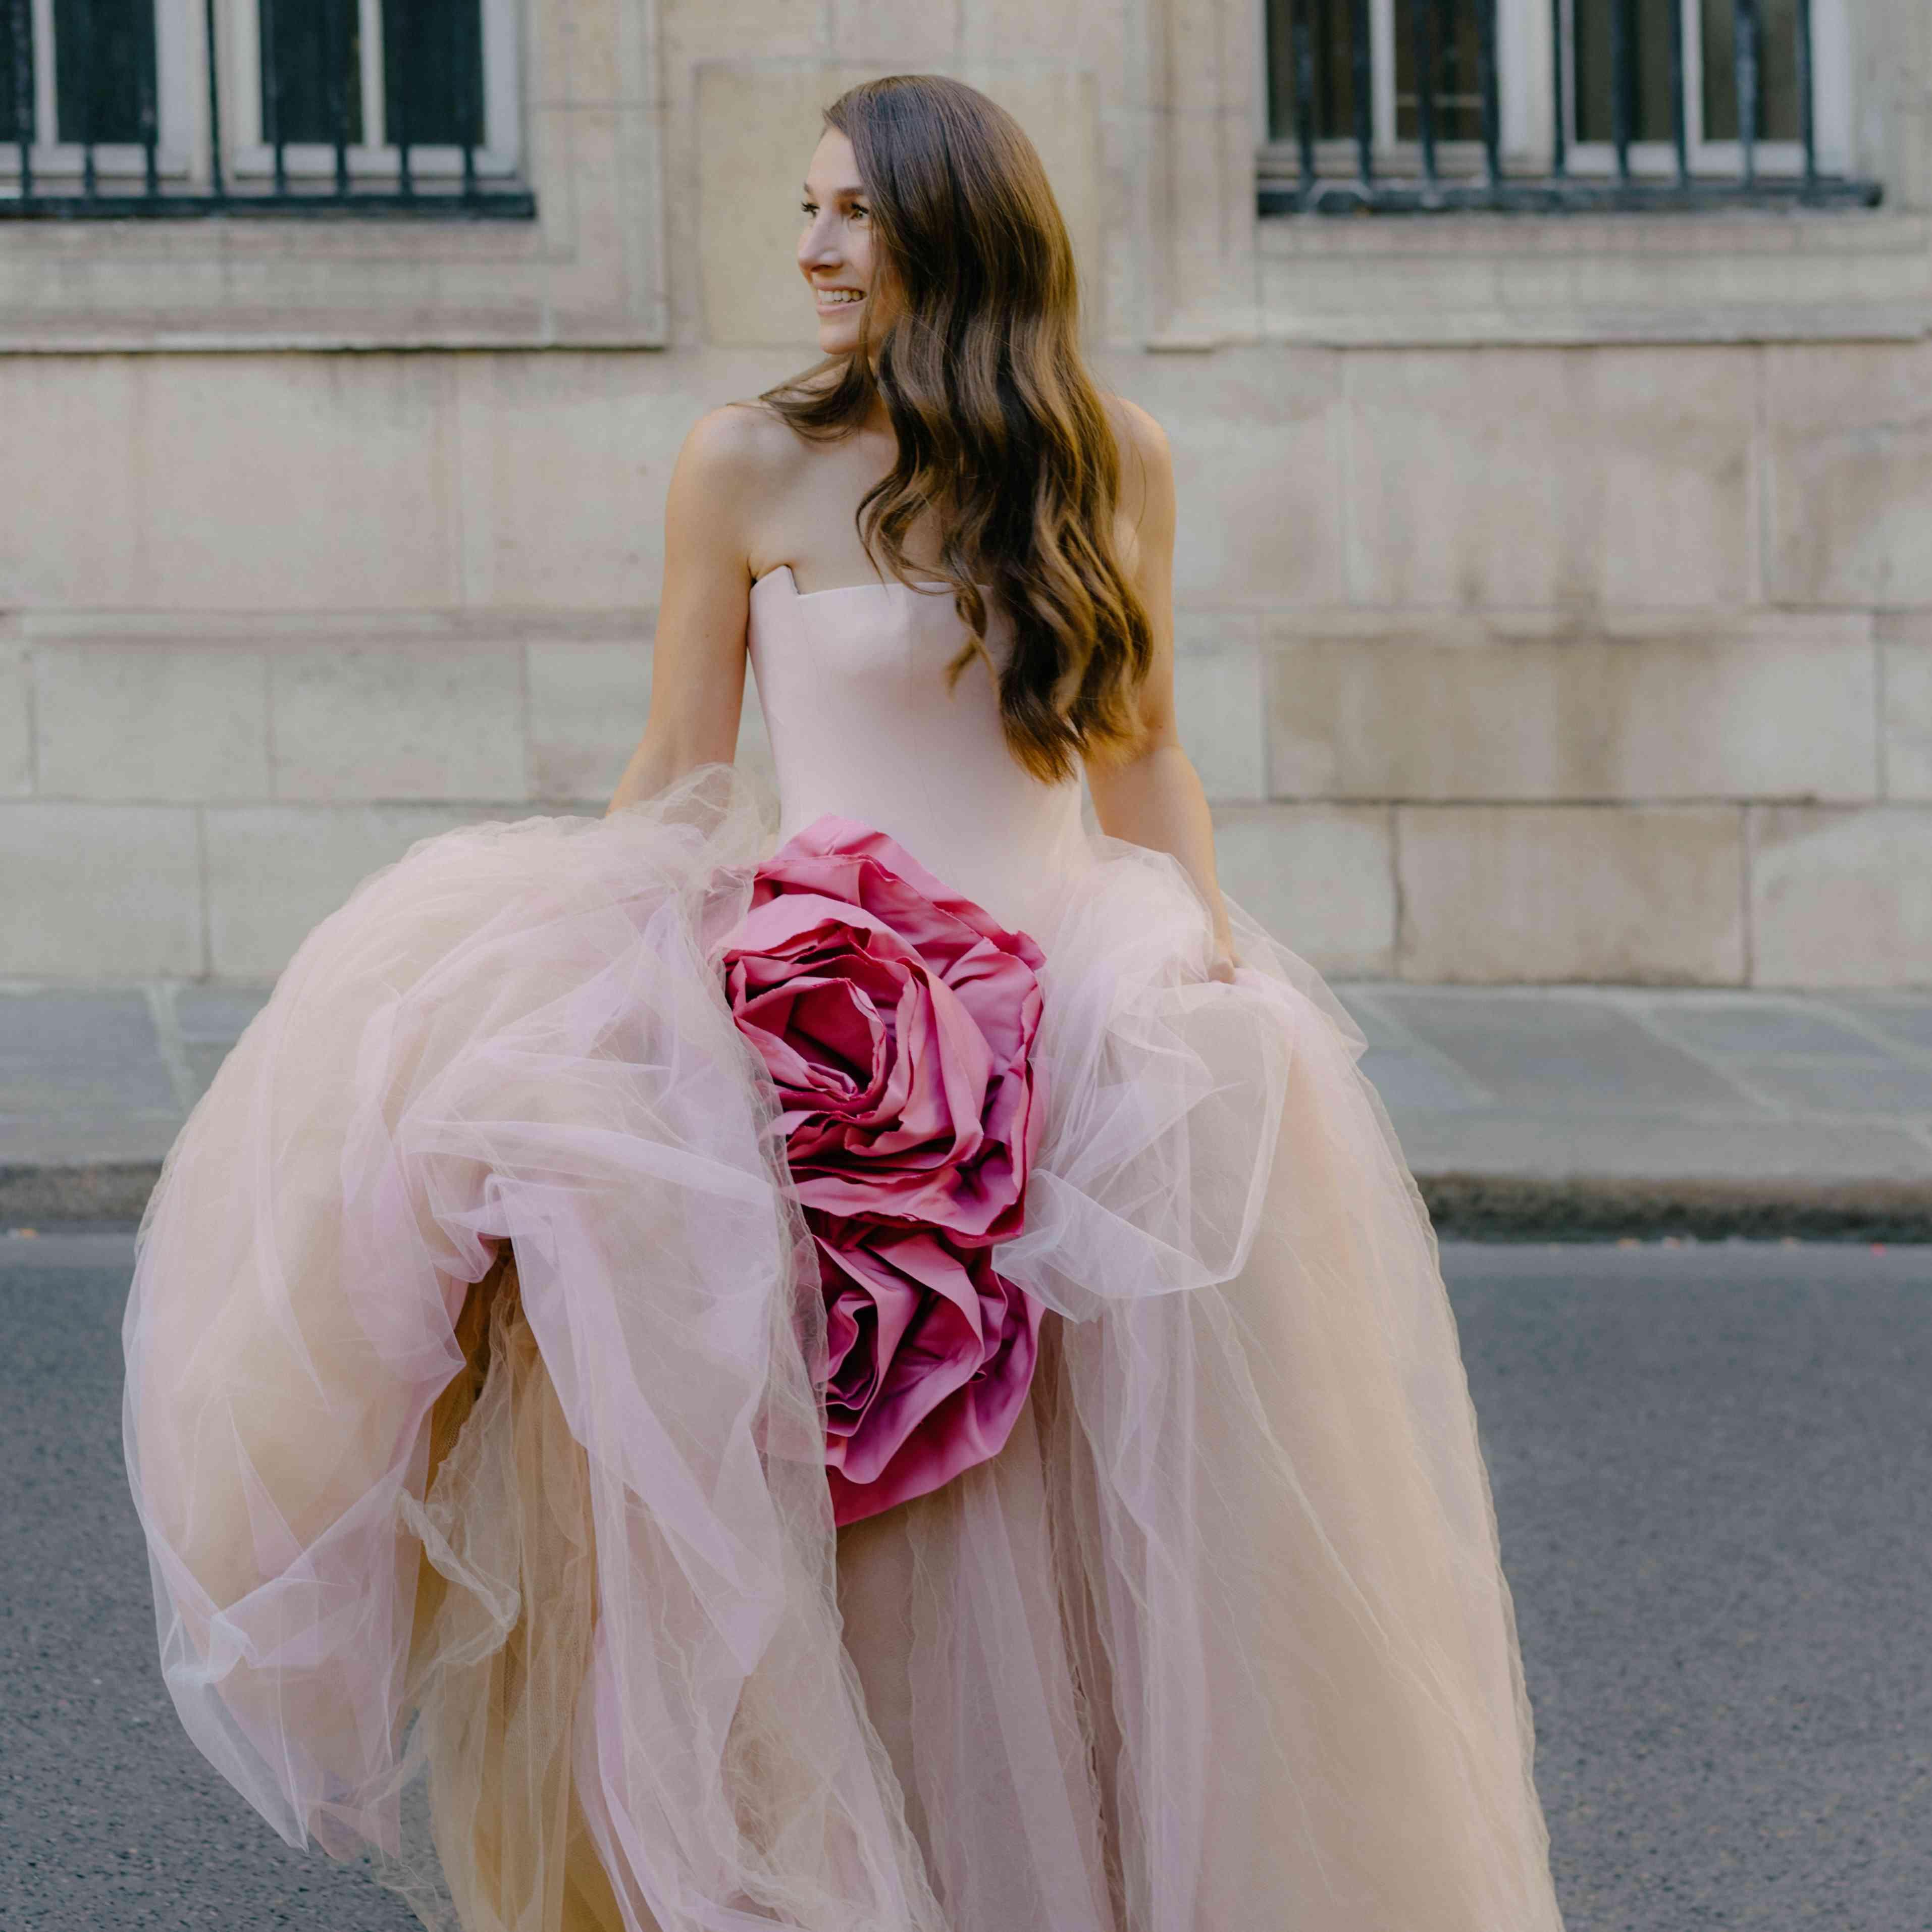 bride on streets of Paris